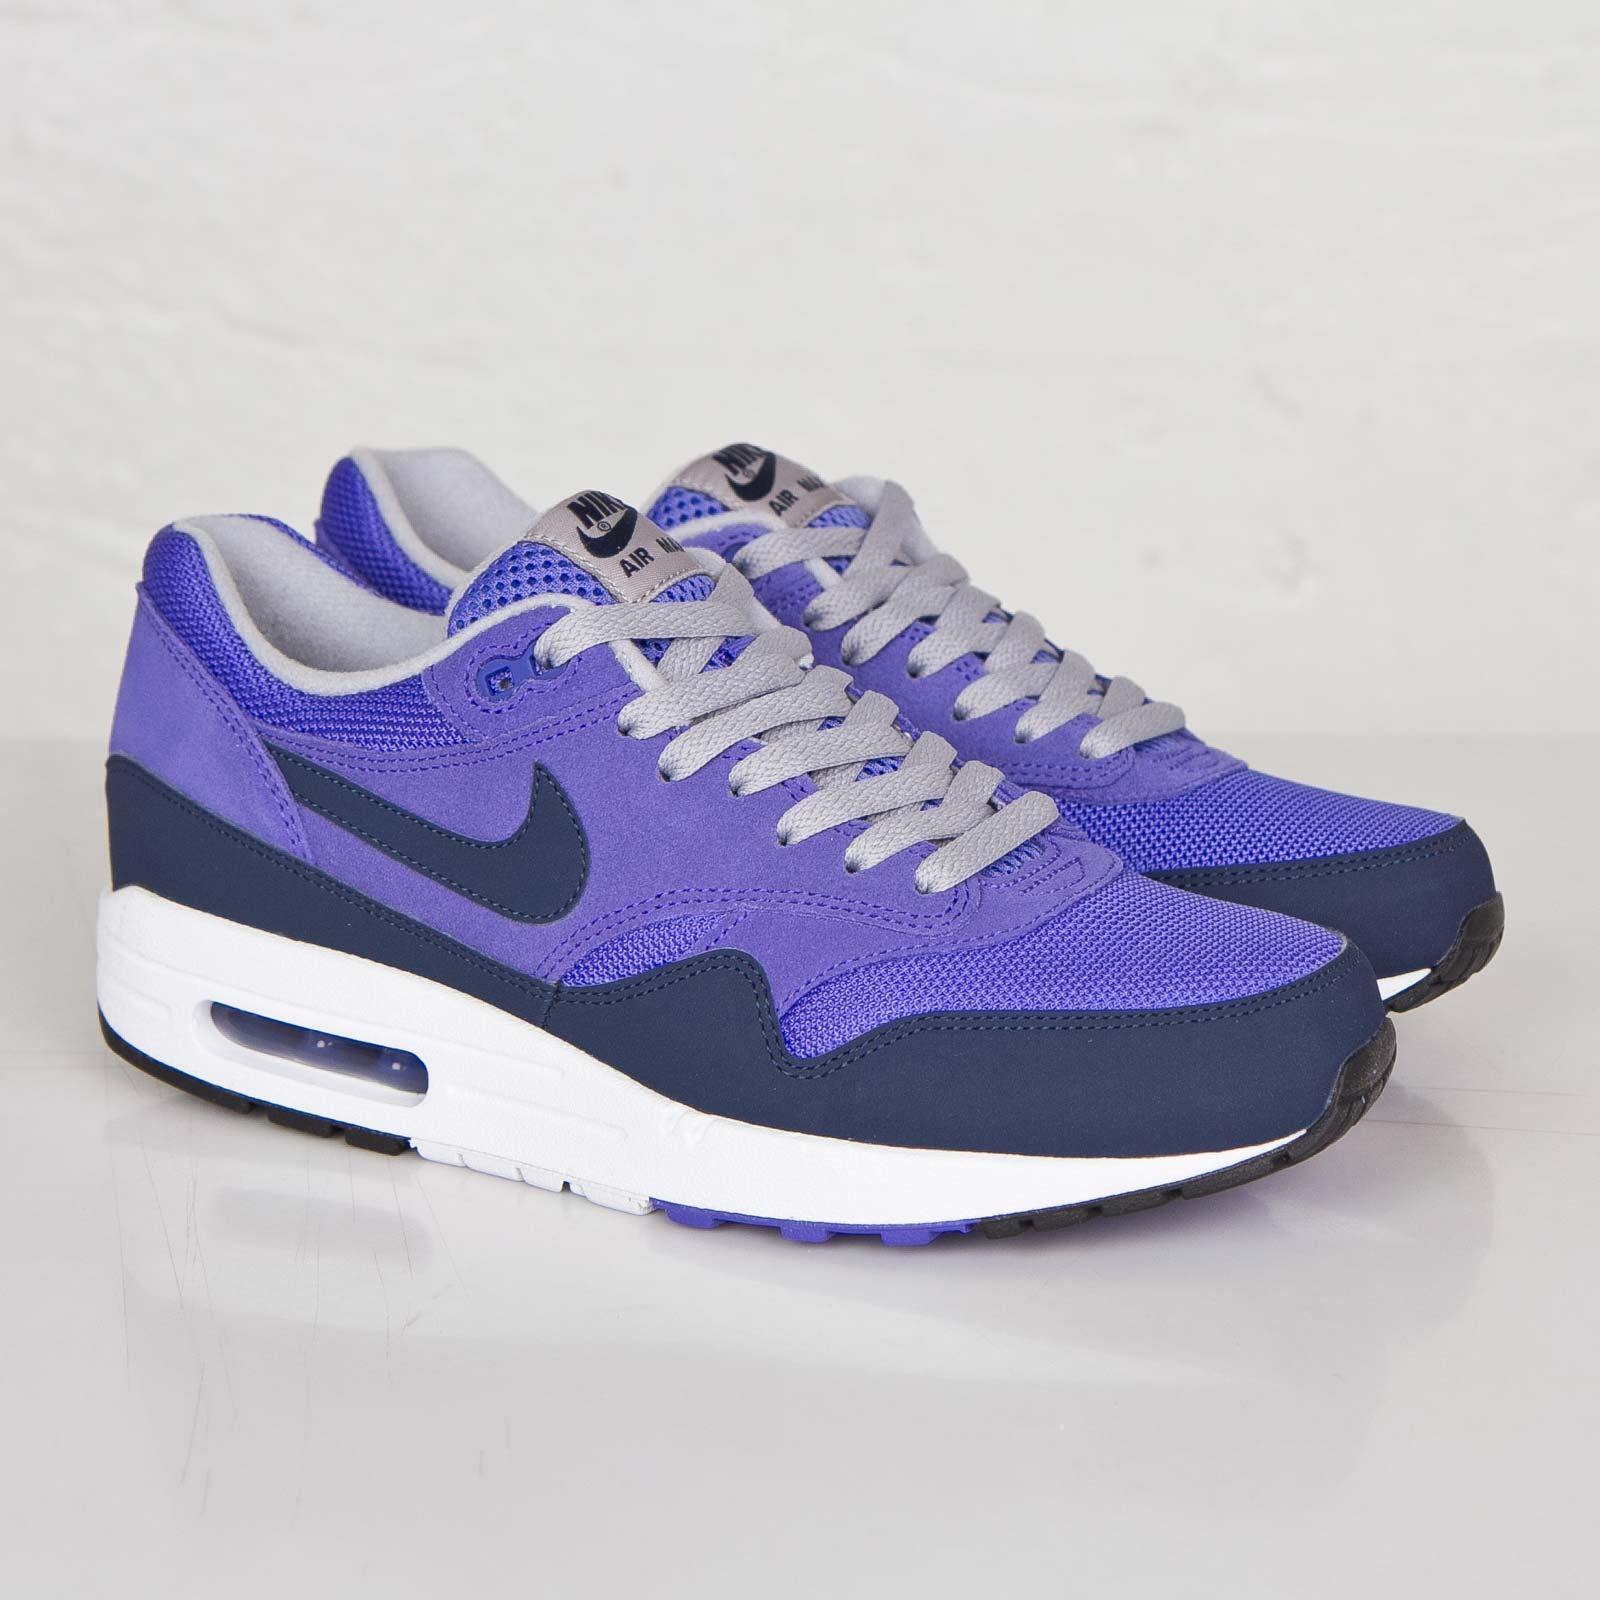 nike air max one femme,chaussure nike air max one violet